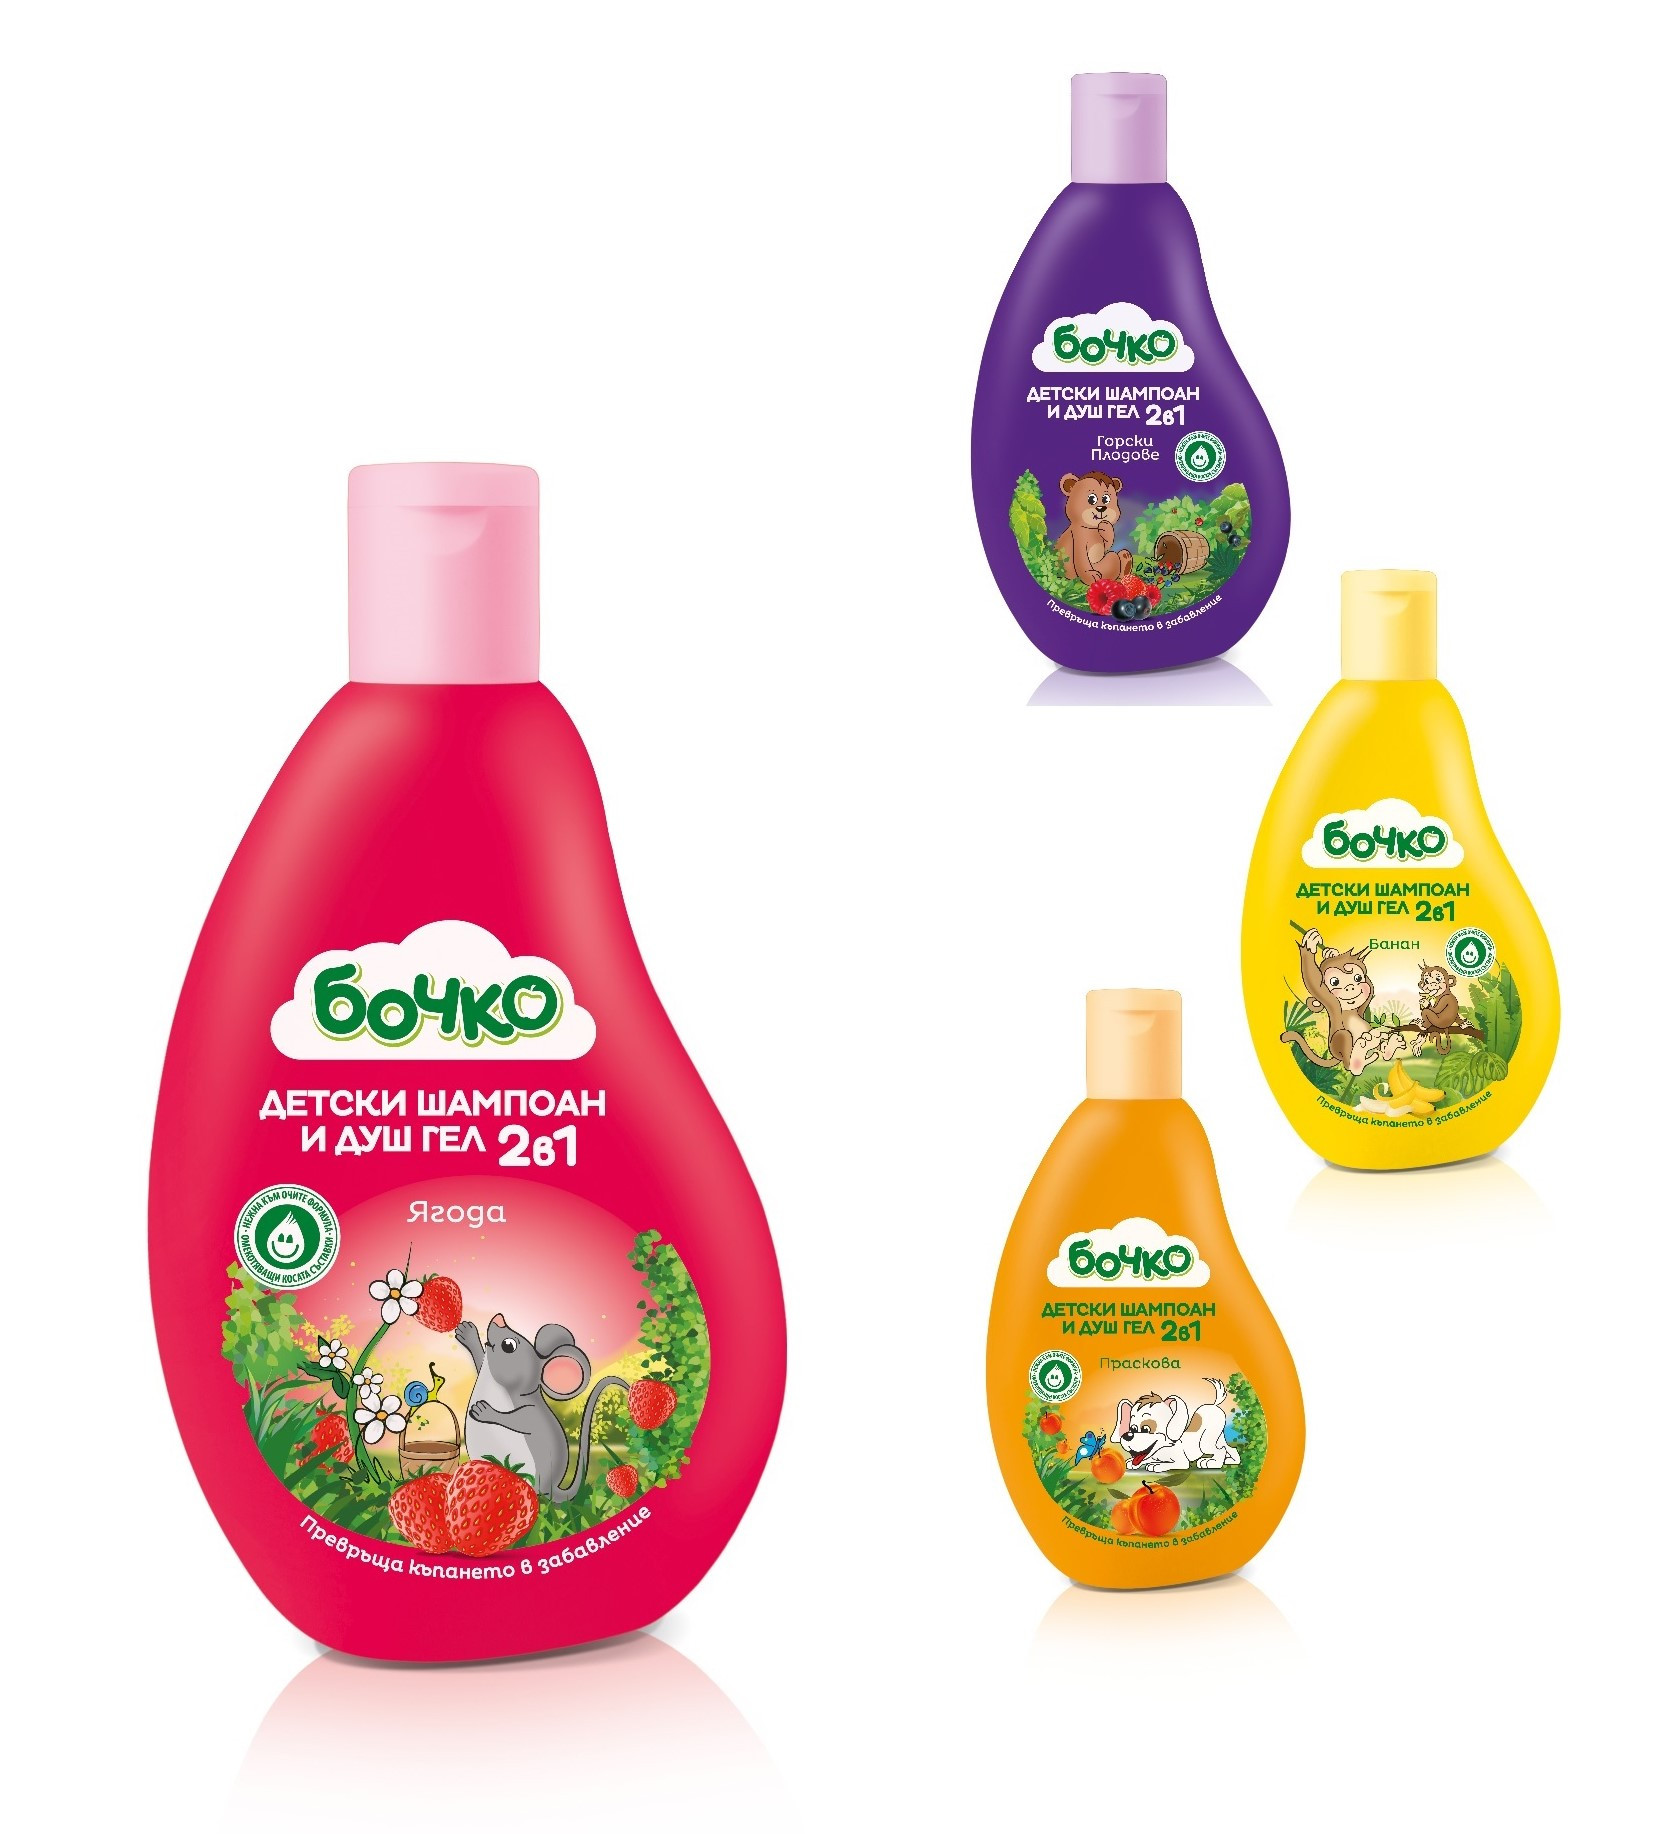 БОЧКО Детски шампоан и душ-гел 2в1 250мл | BOCHKO Kids shampoo and shower gel 2in1 250ml